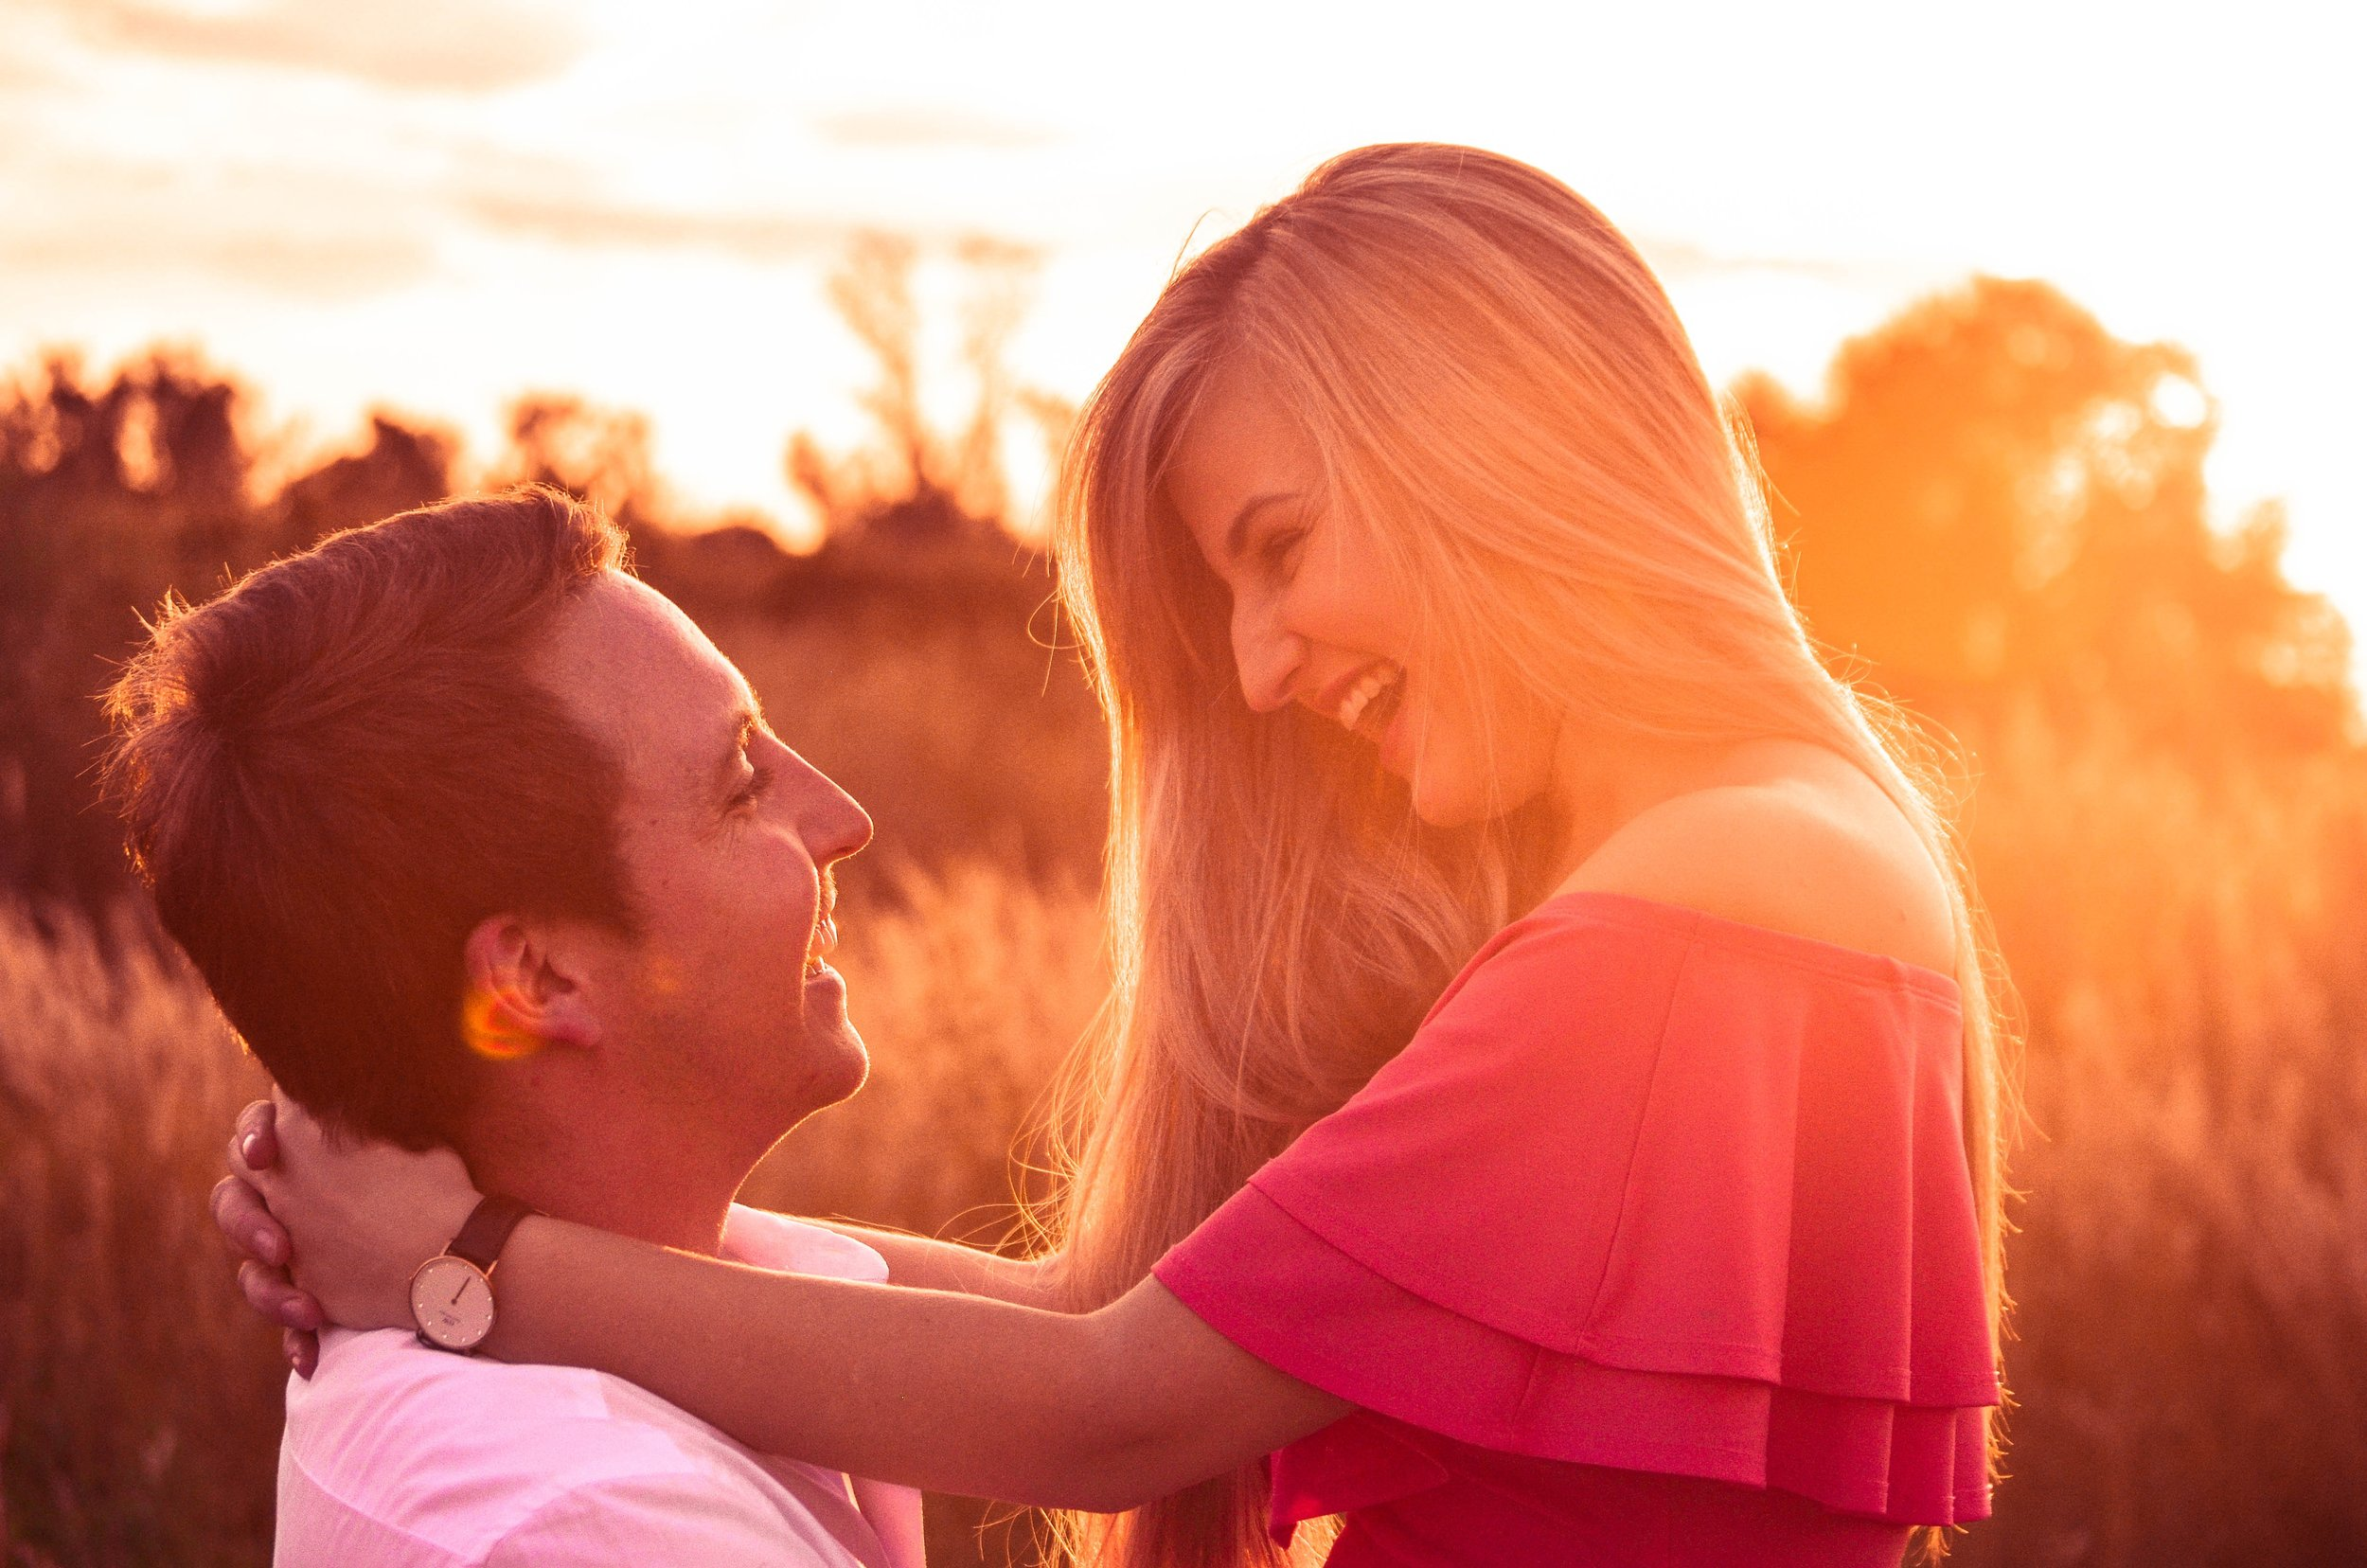 Smart Dating - Blog despre dating, evenimente & dezvoltare personală